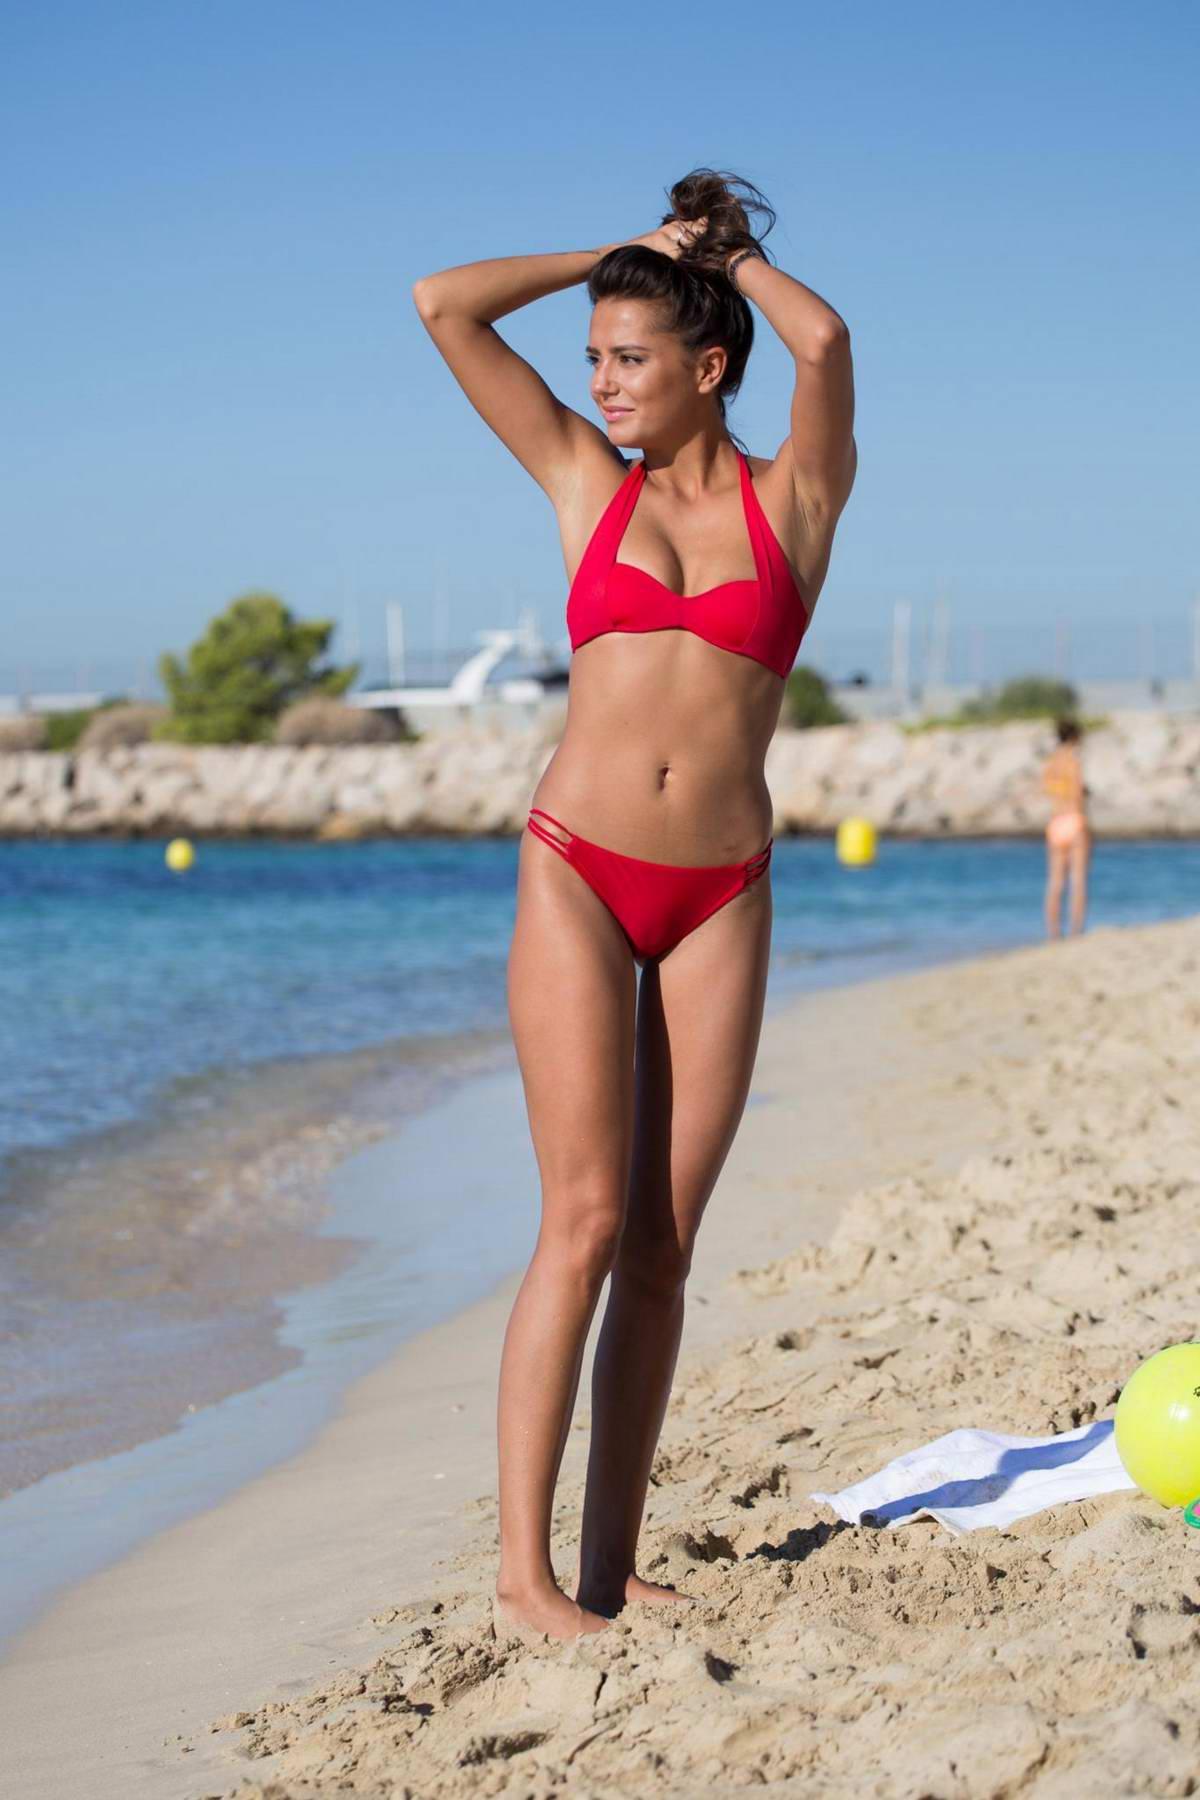 Tyla Carr in a red bikini enjoying the beach in Mallorca, Spain